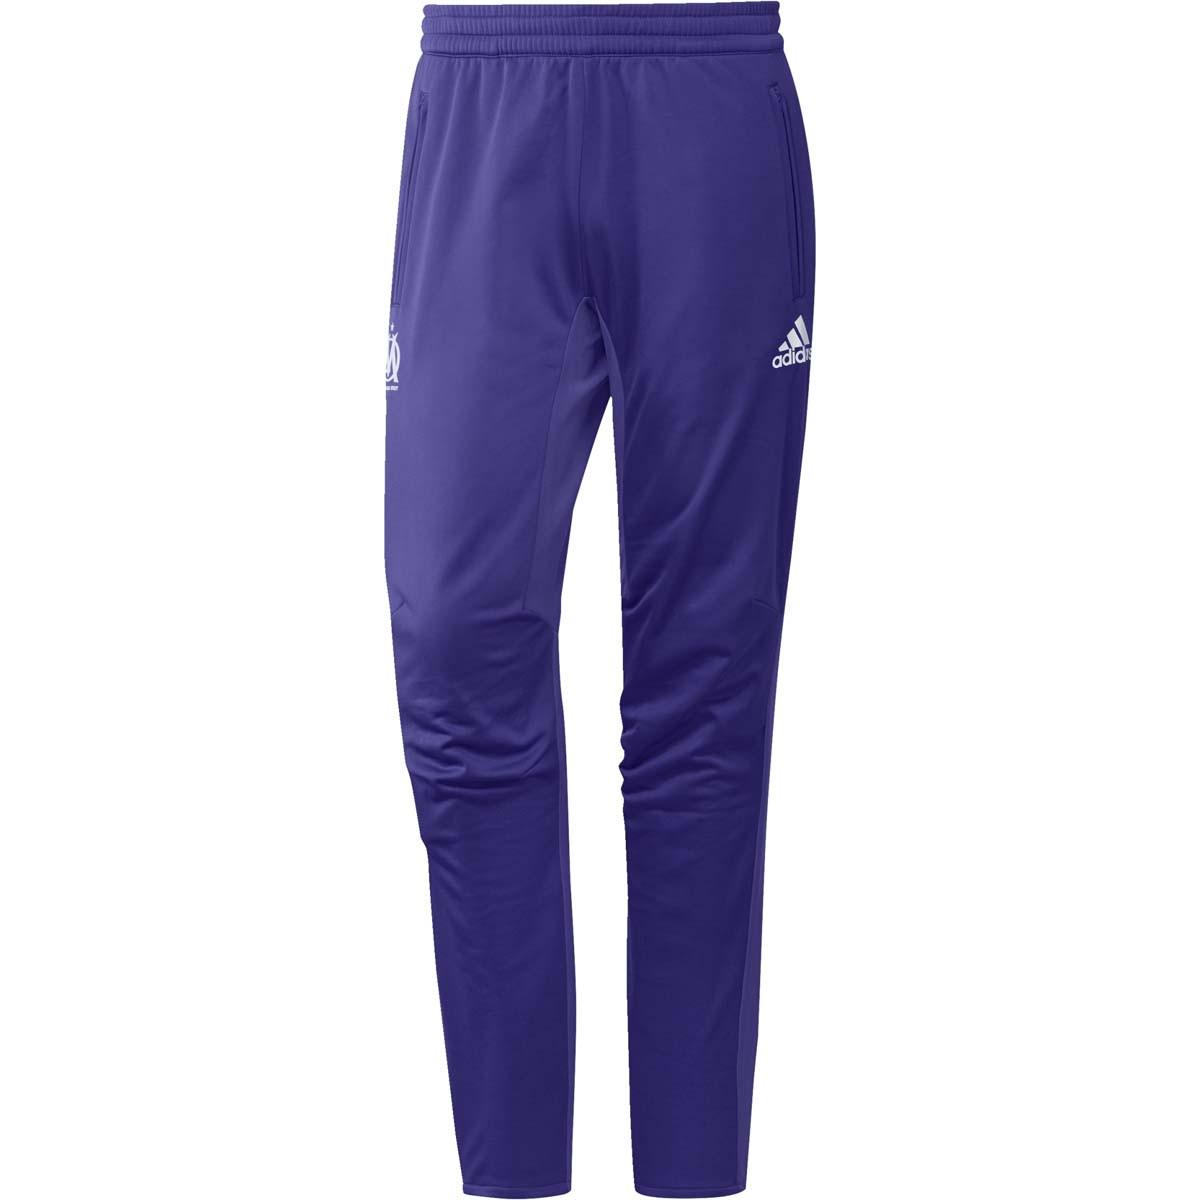 Violet Entrainement Eu Rayon Trg 20172018 Pant Pantalon Om Adidas IwHFpqI